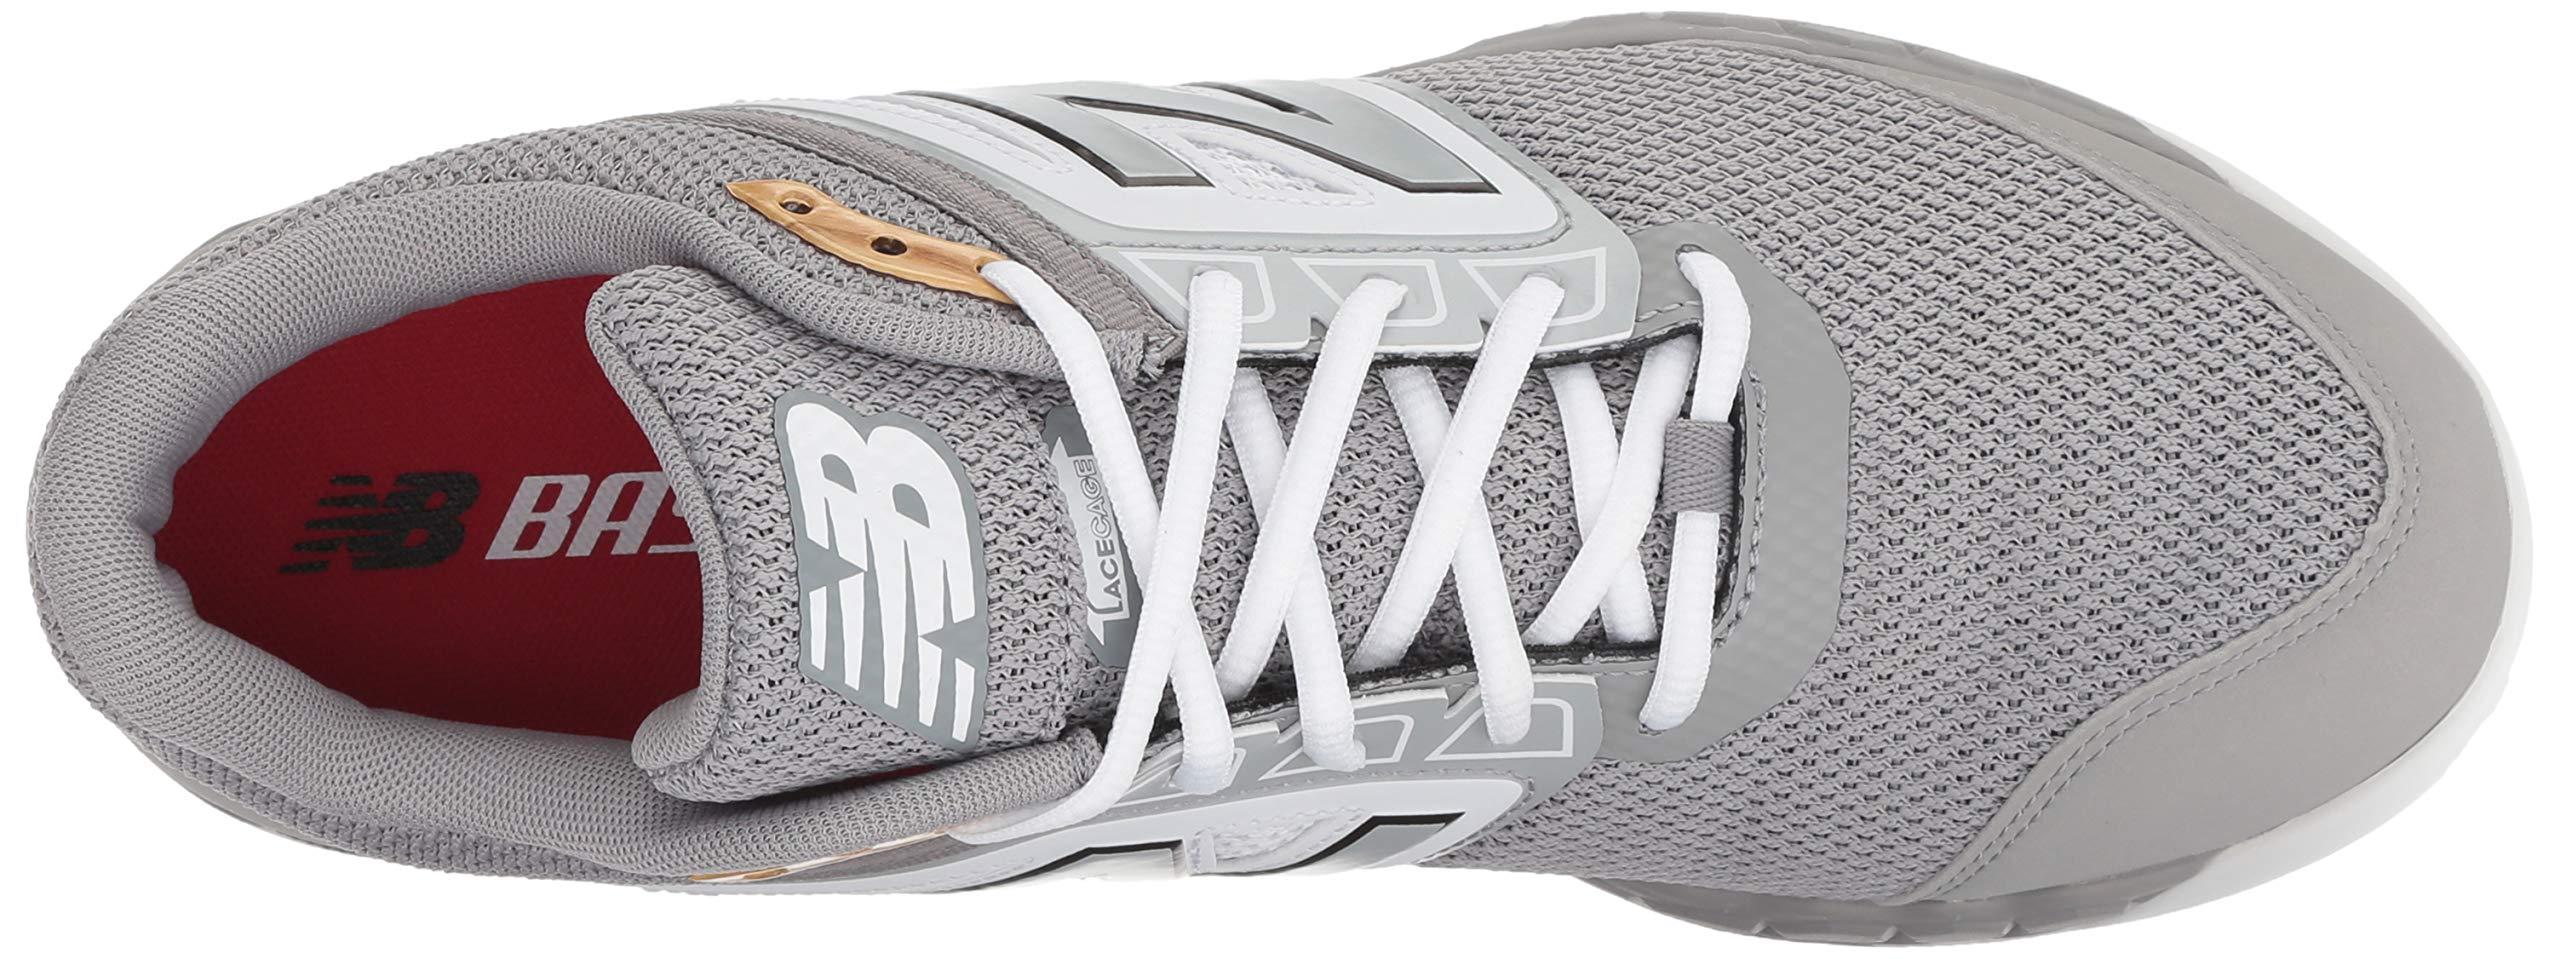 New Balance Men's 3000v4 Turf Baseball Shoe, Grey/White, 5 D US by New Balance (Image #7)